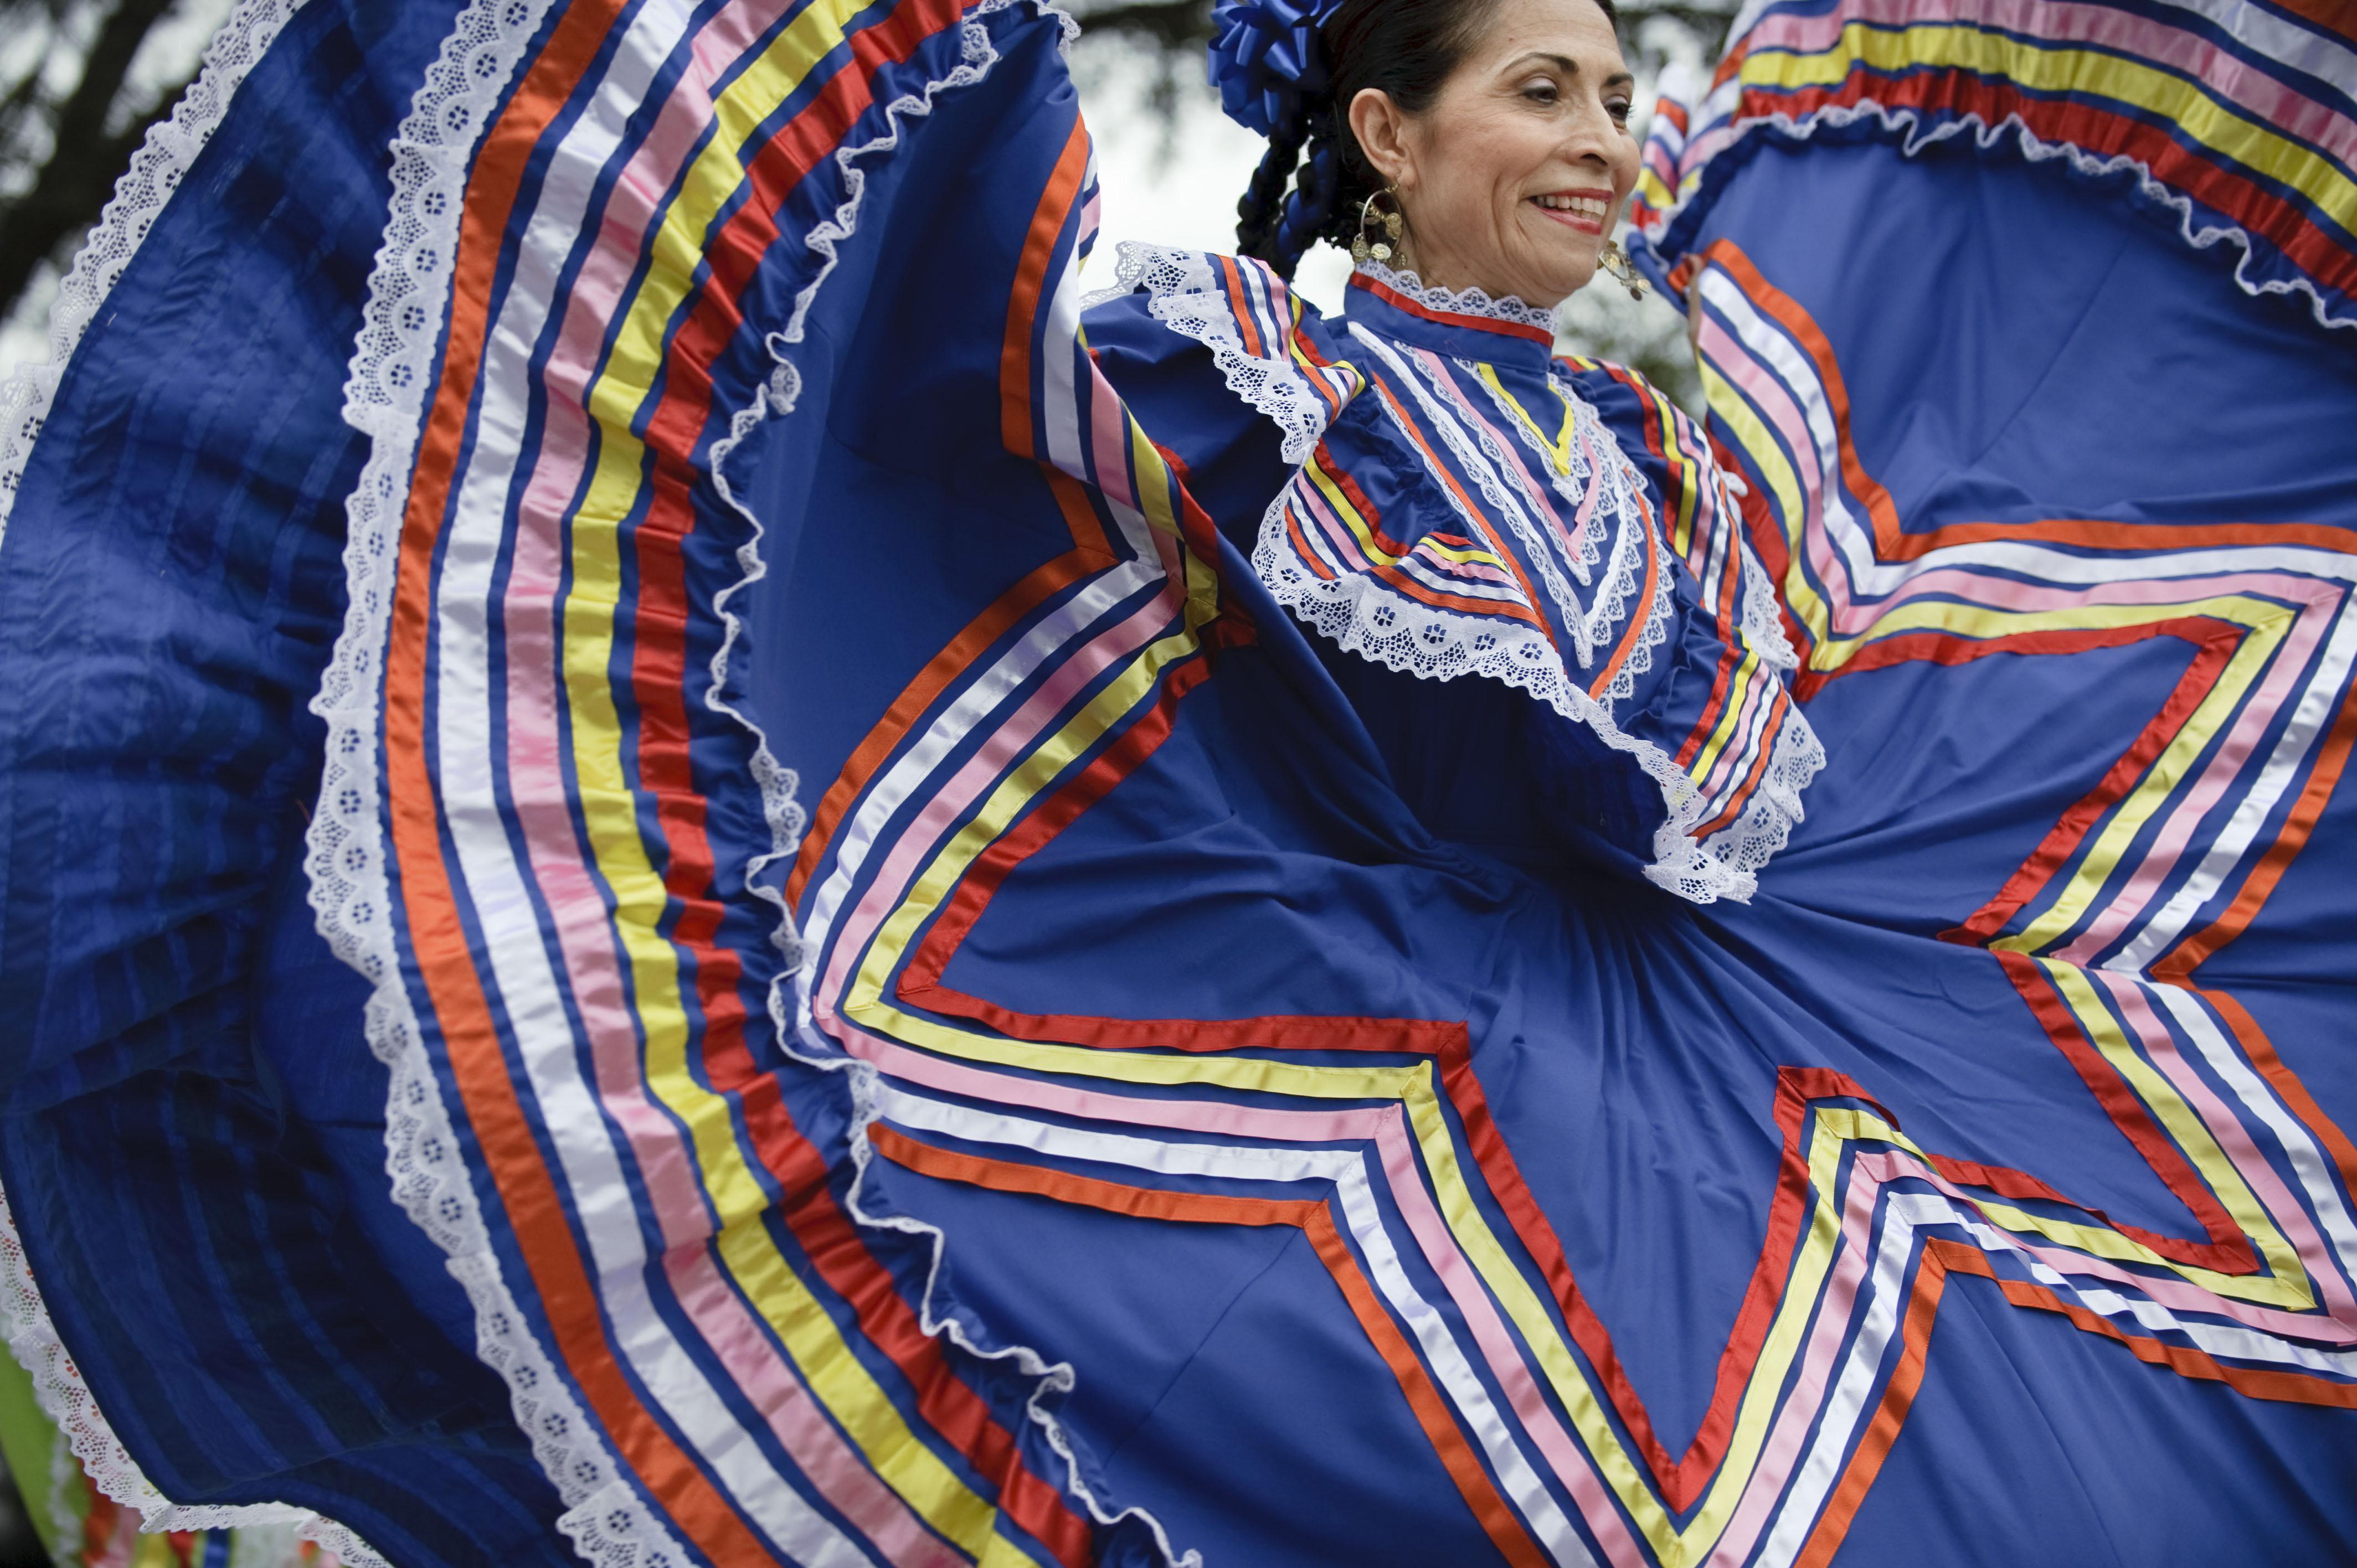 Hispanic Heritage Month Off To Festive Start With Folk